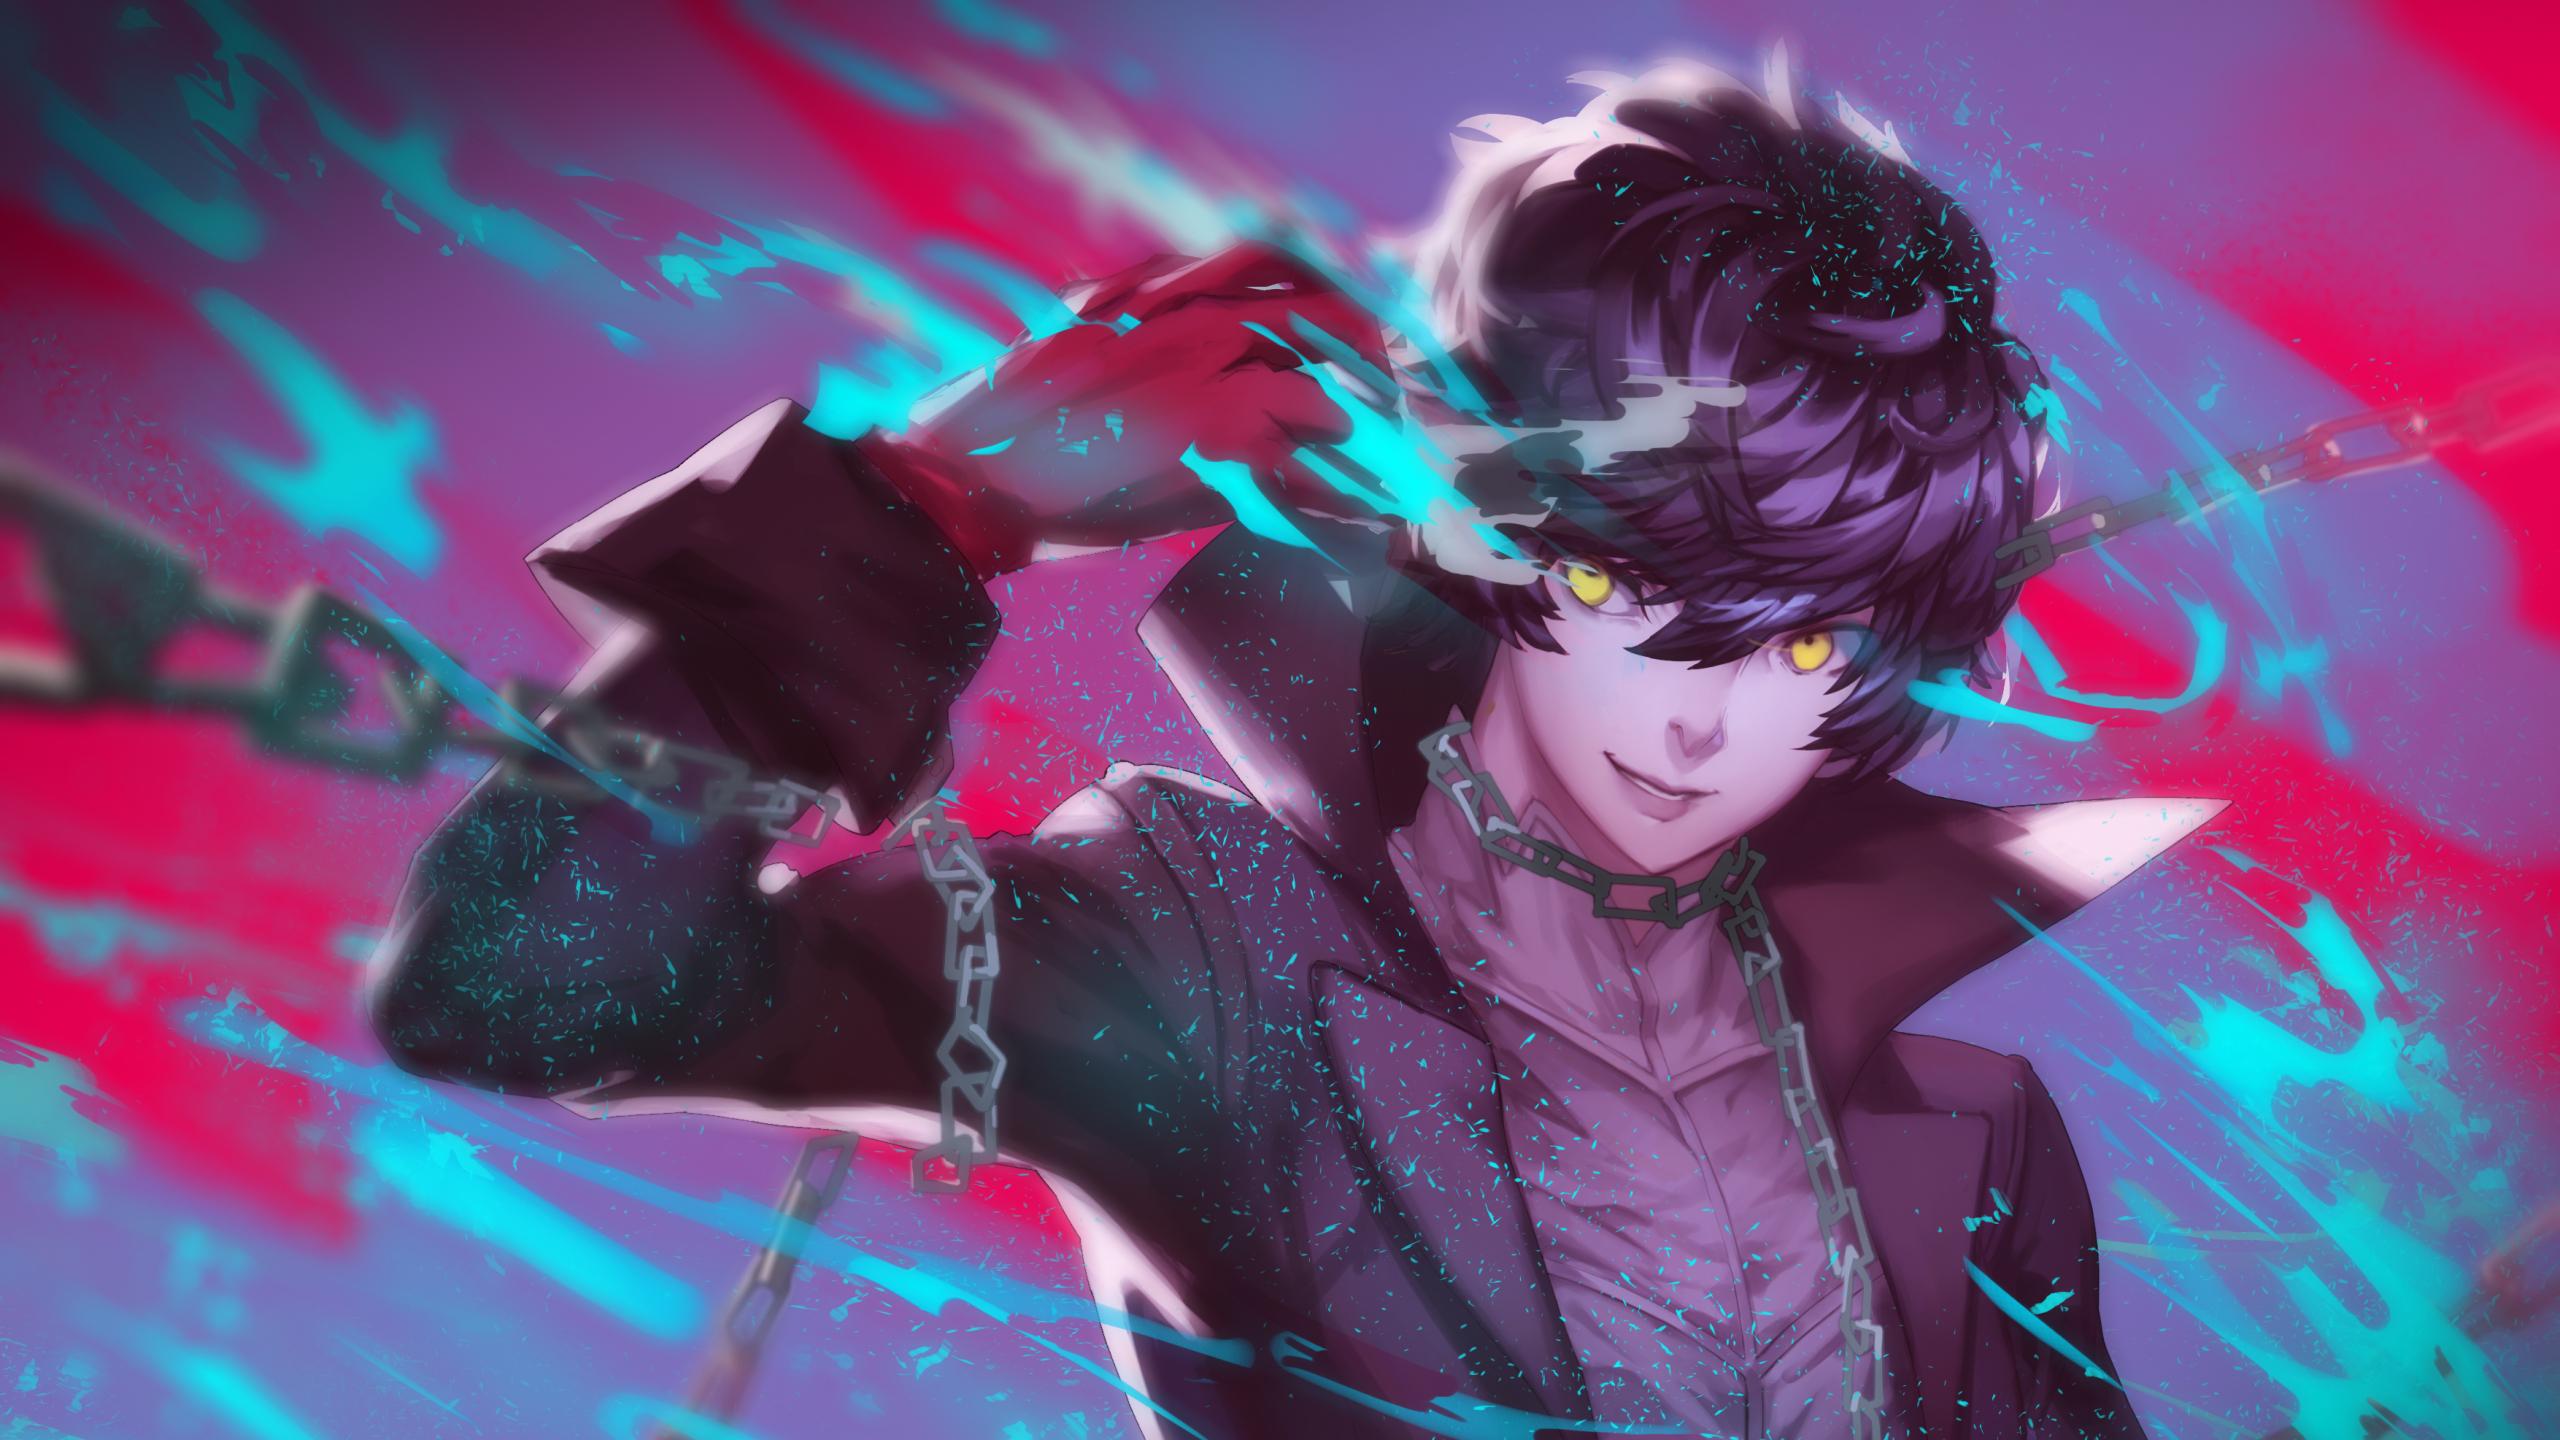 2560x1440 Persona 5 Akira Kurusu Joker 1440p Resolution